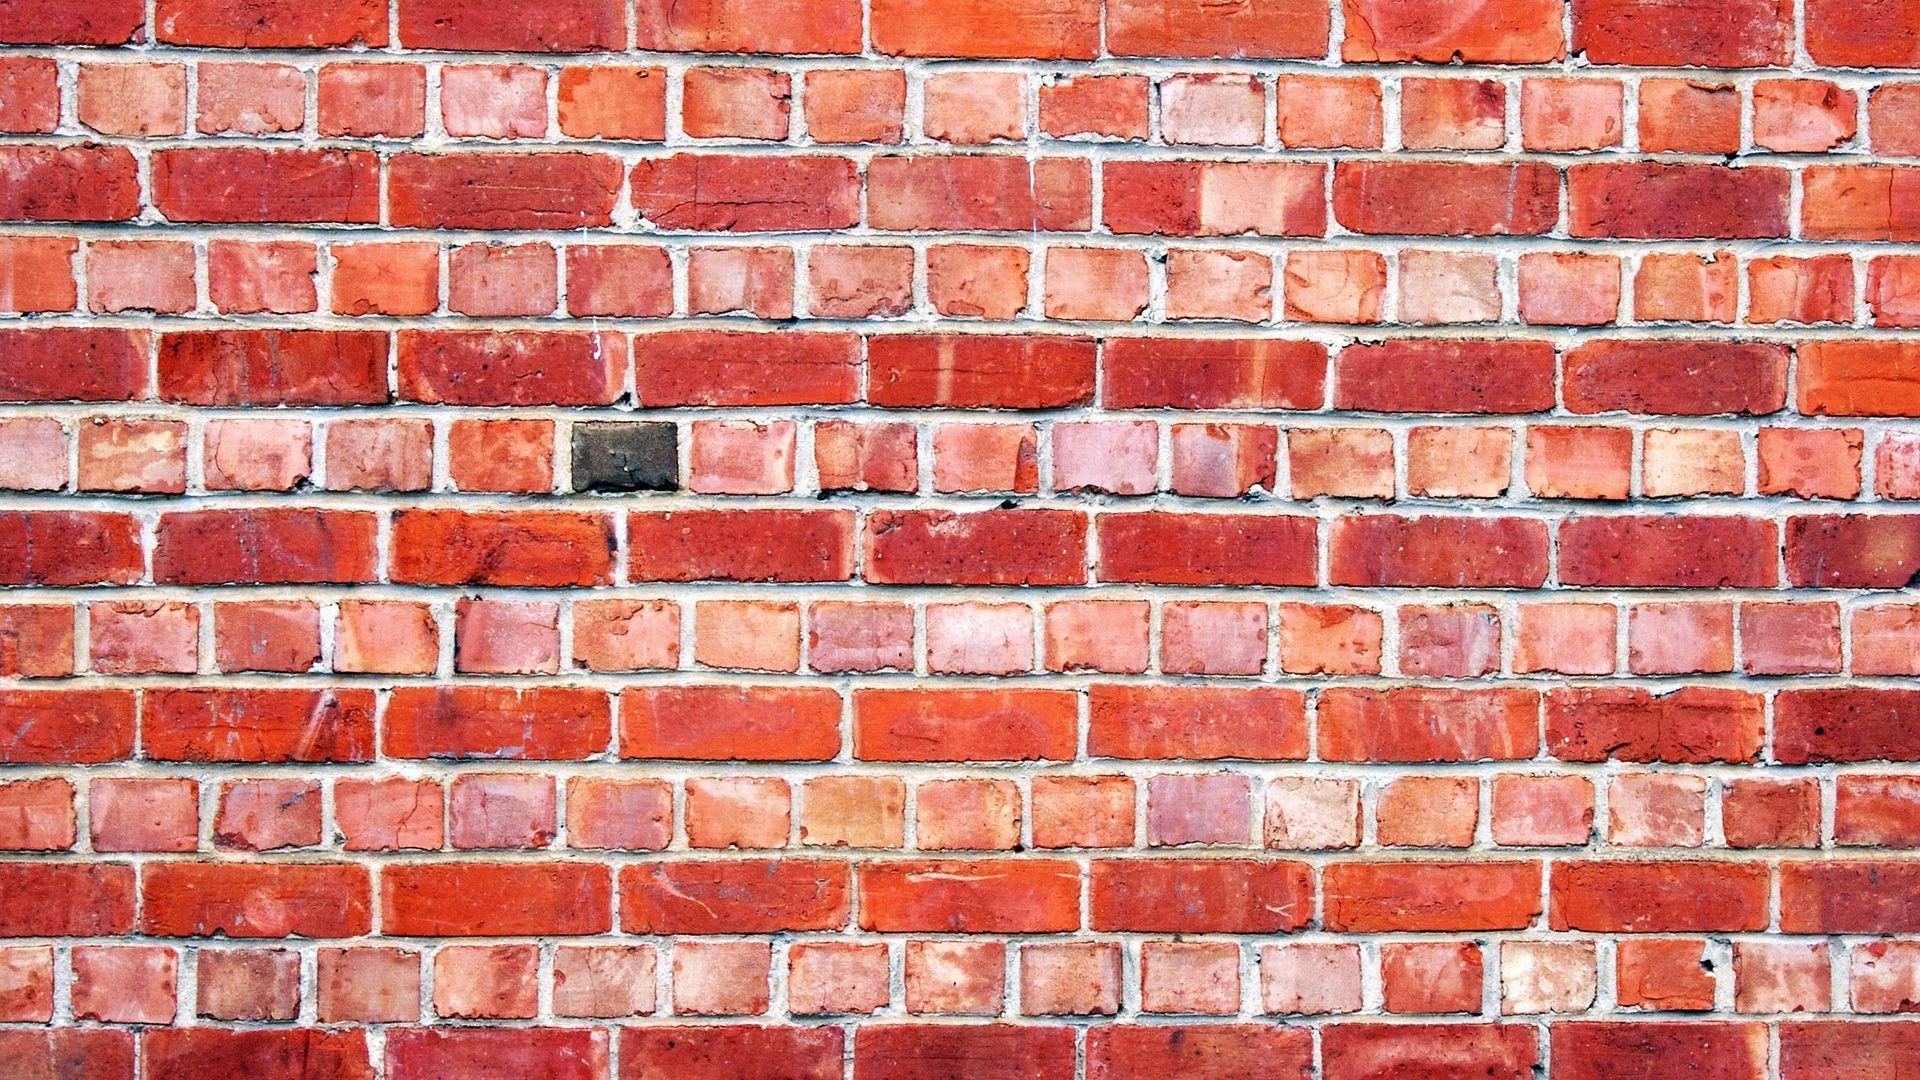 Wallpaper Wall Background Texture Surface Brick In 2021 Brick Wallpaper Hd Fake Brick Wallpaper Brick Wall Wallpaper Hd wallpaper texture surface wall brick